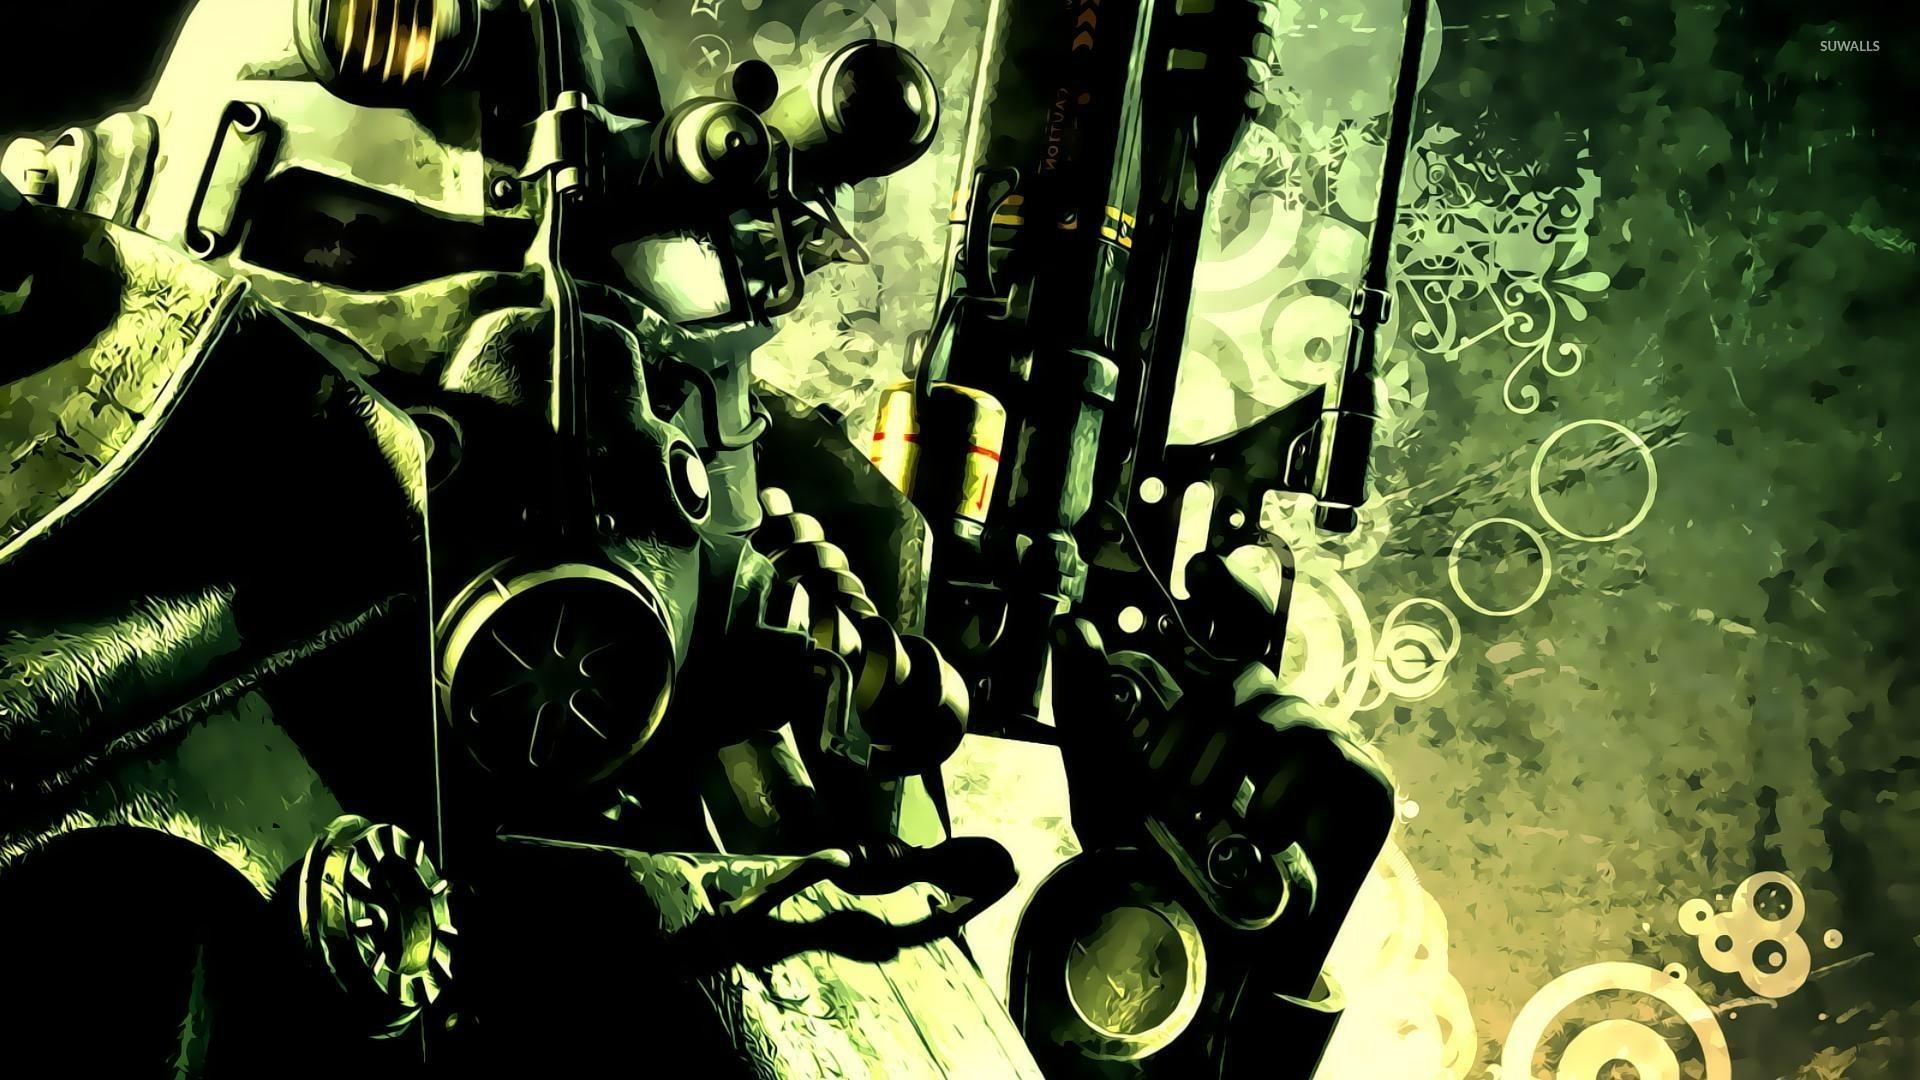 Fallout [5] wallpaper jpg